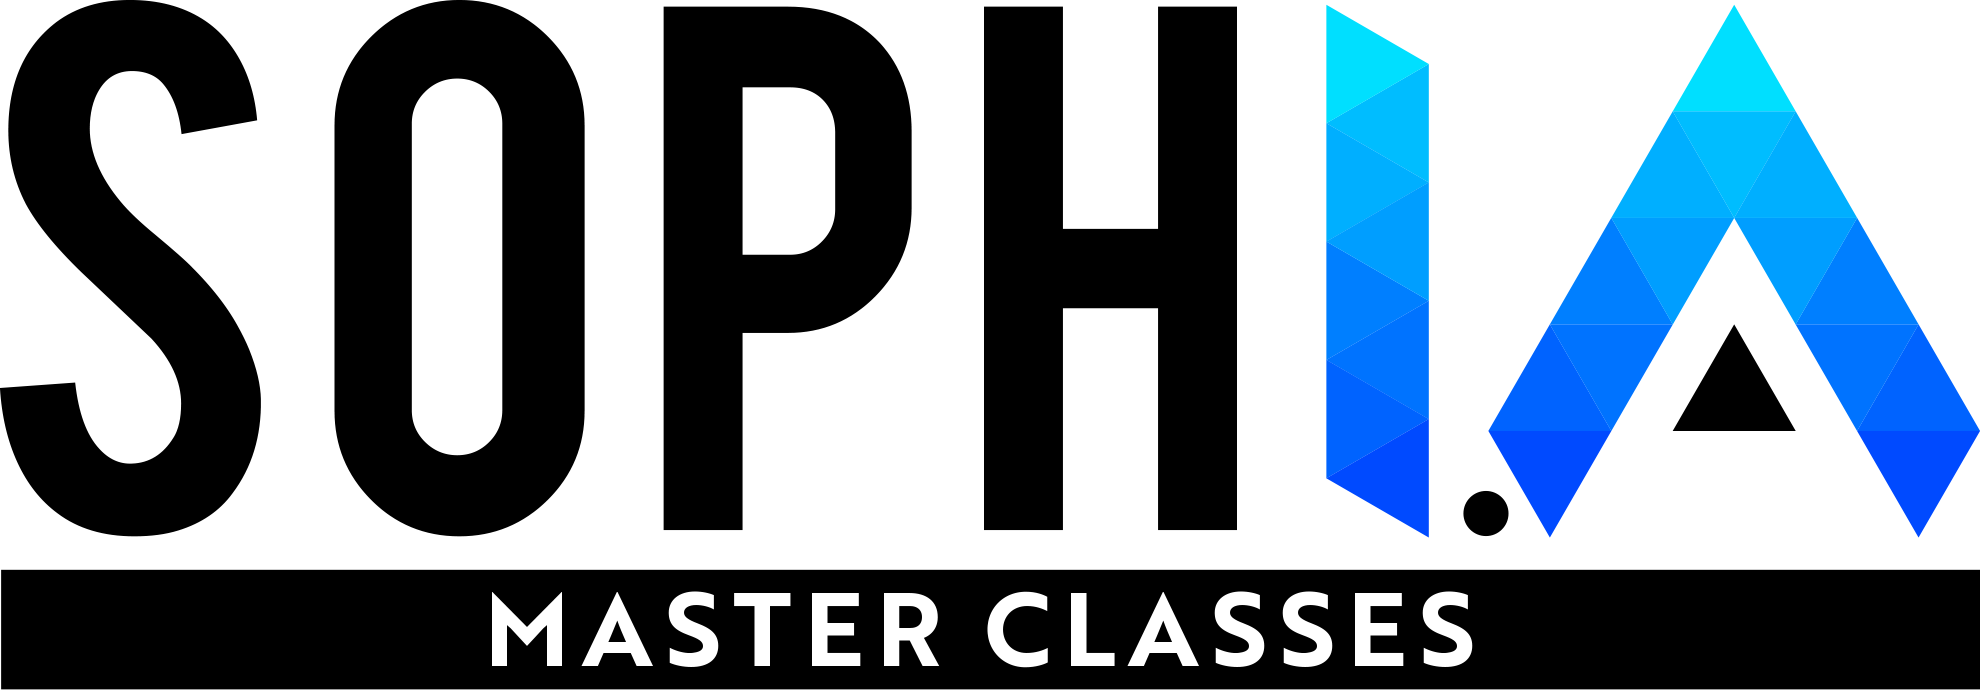 logo sophA master classes